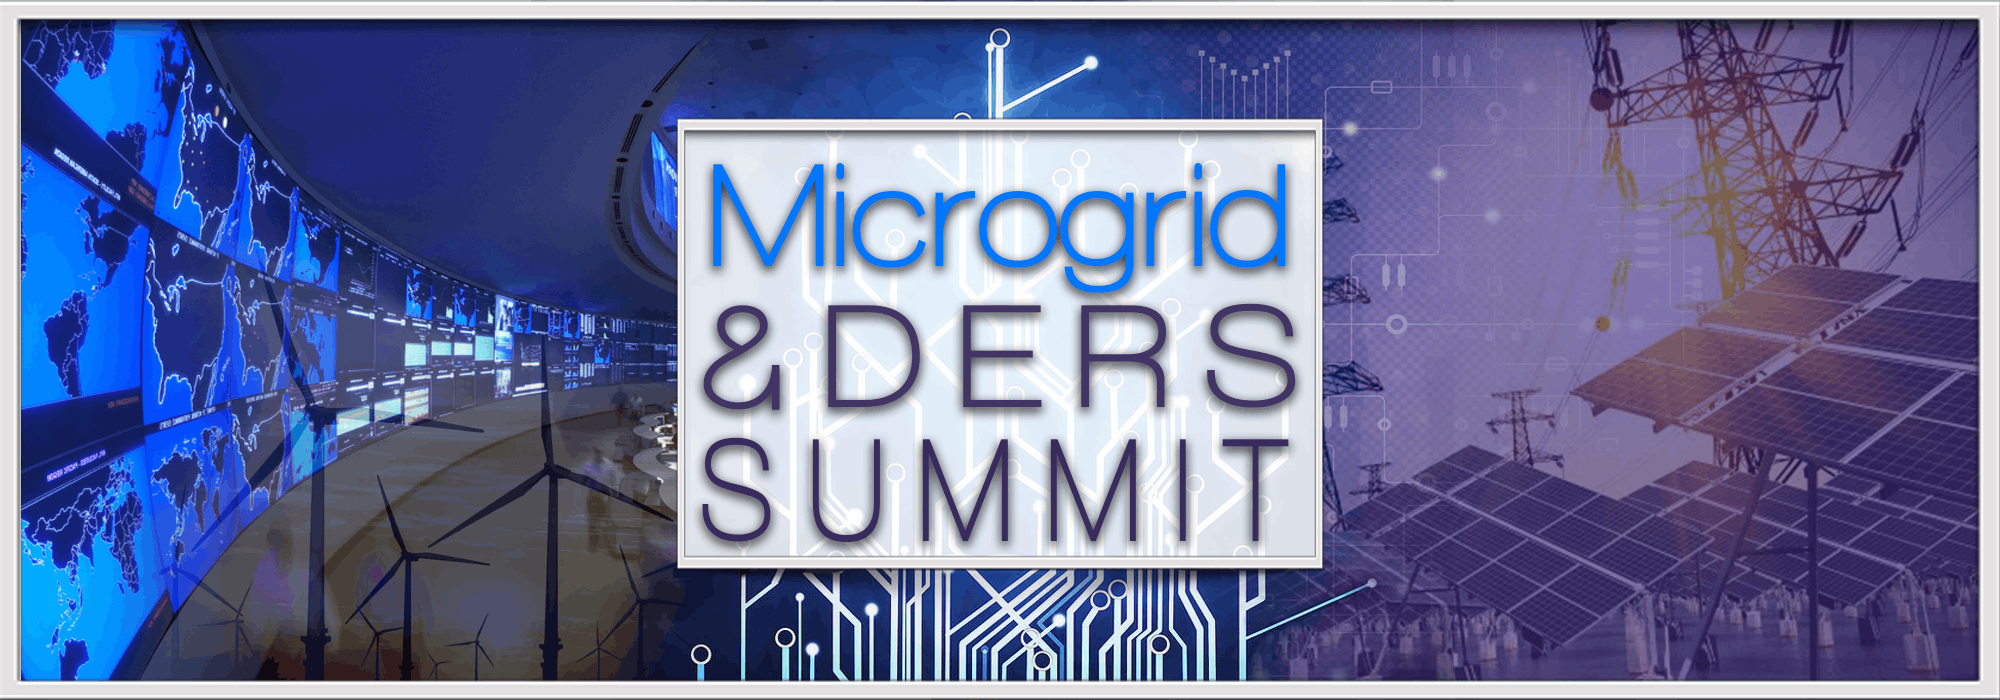 Microgrid Banner